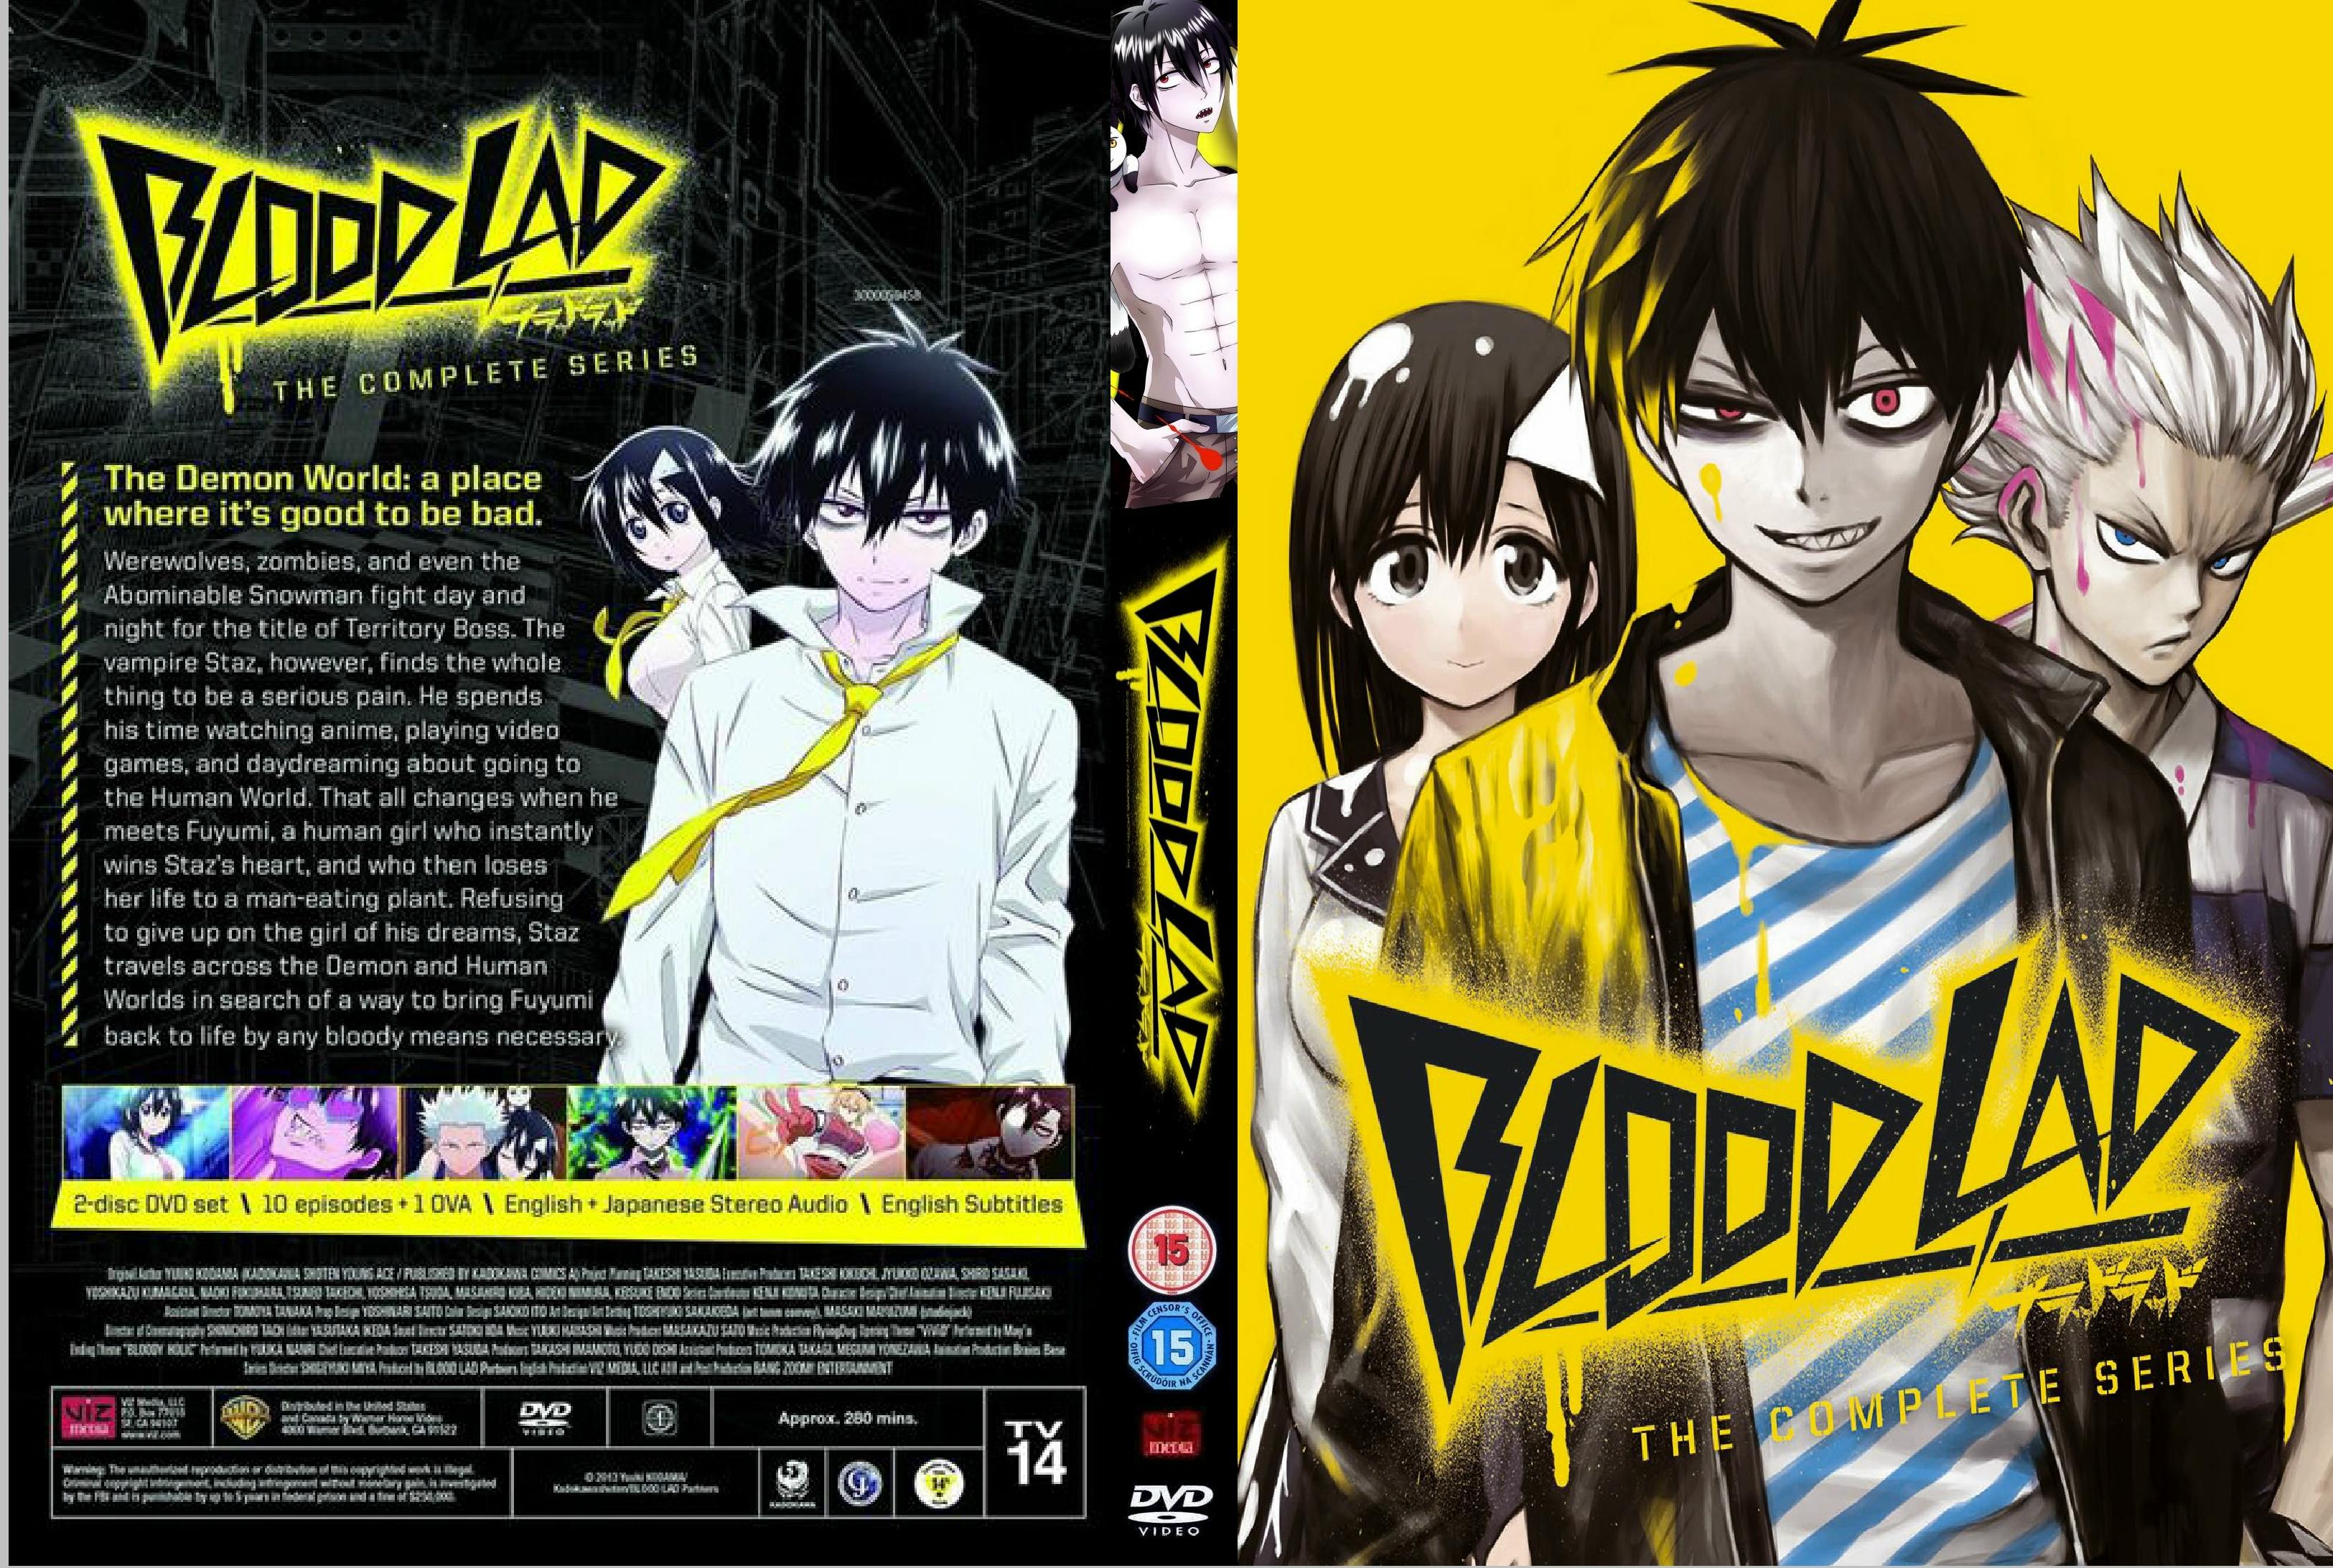 Covers box sk blood lad season 1 high quality dvd blueray